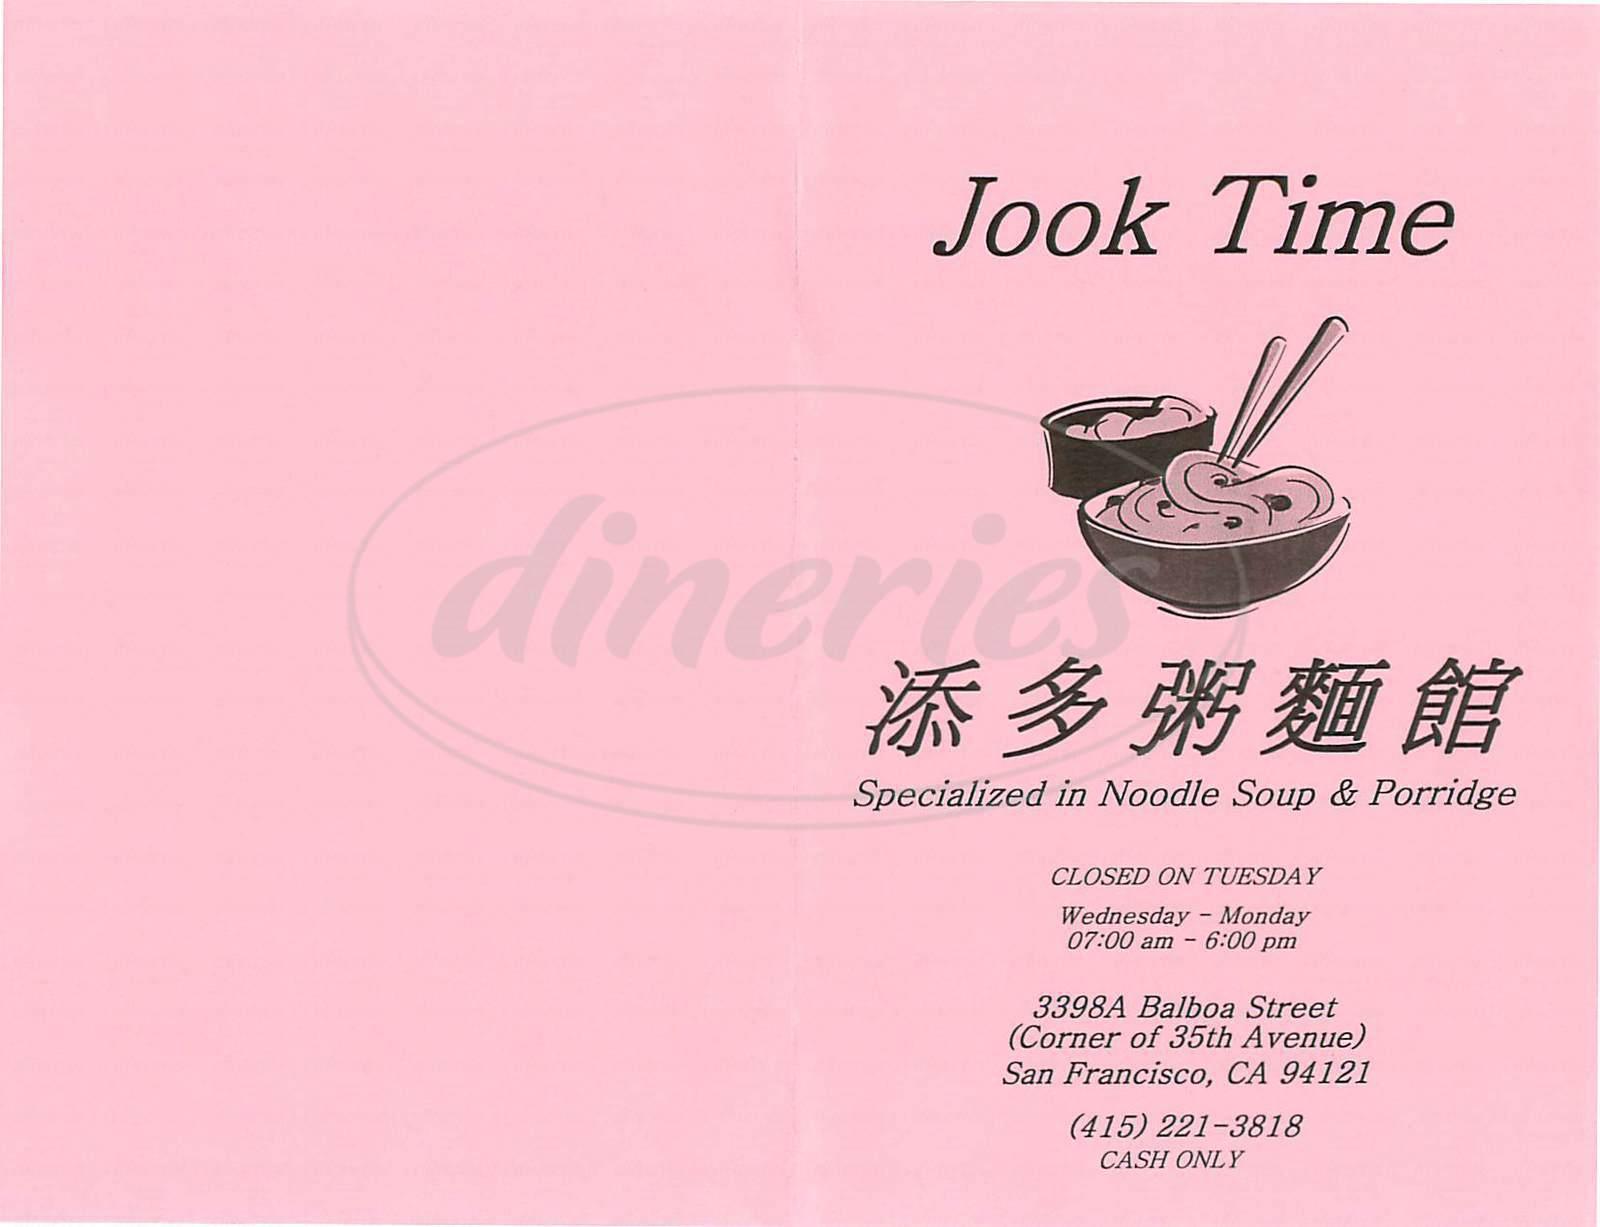 menu for Jook Time